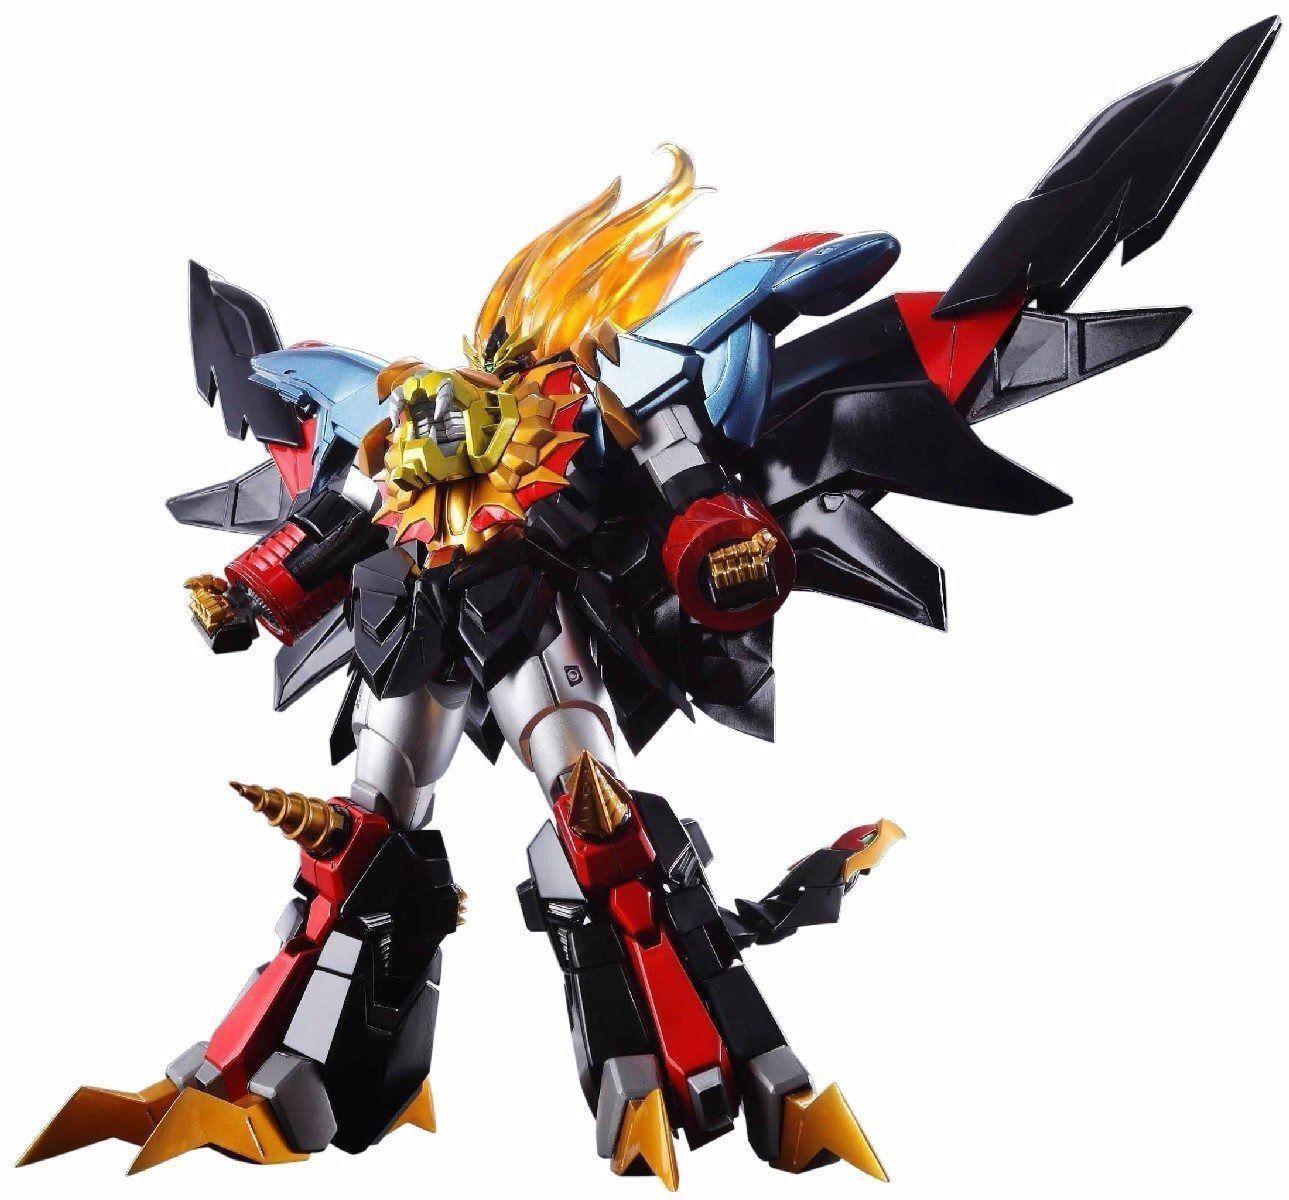 Super Robot Chogokin Genesic Gaogaigar Action Figure Bandai Tamashii Nazioni